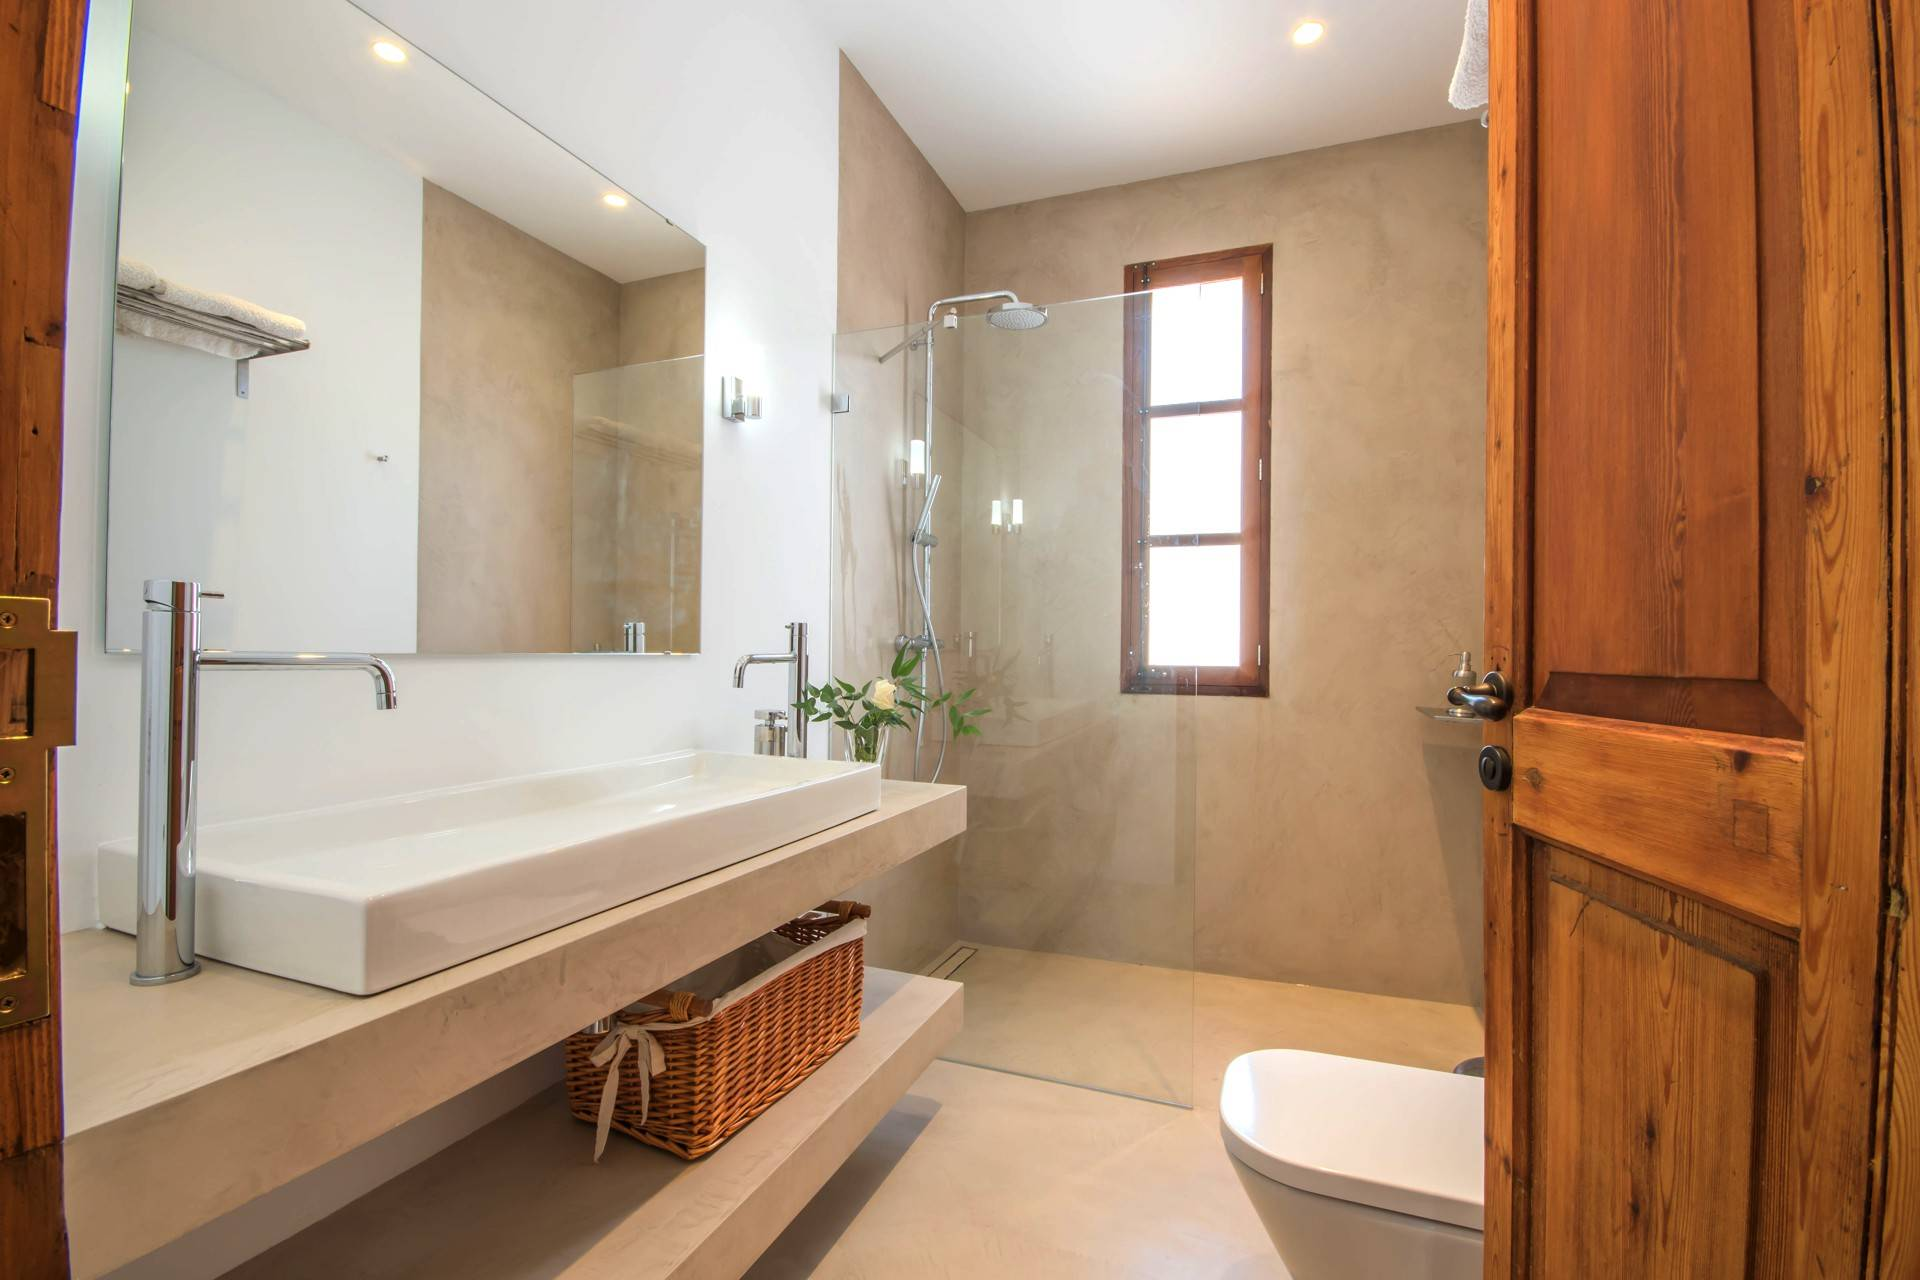 01-257 Luxus Ferienhaus Mallorca Südwesten Bild 21